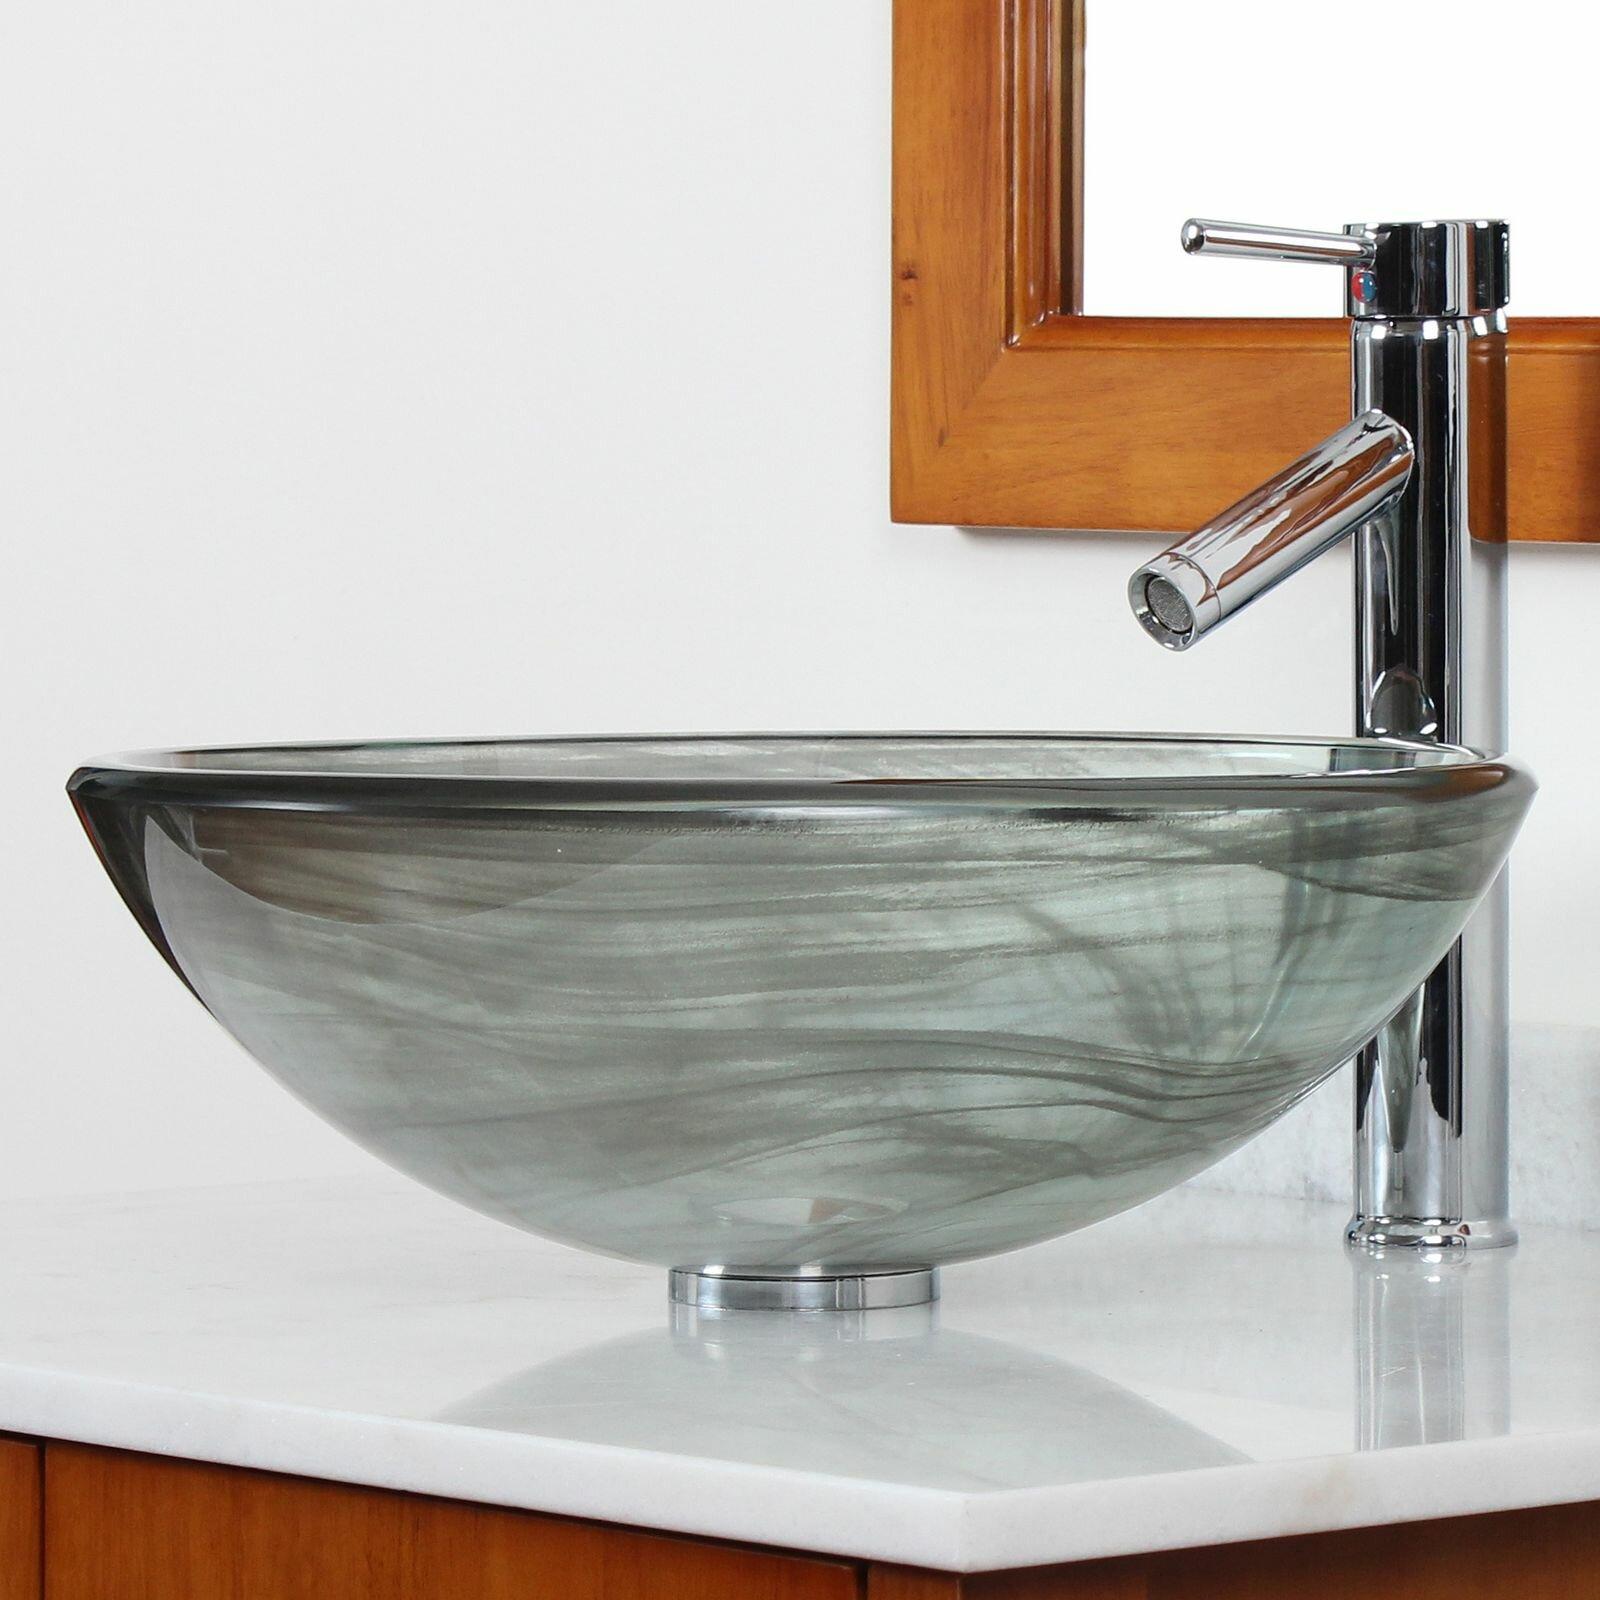 elite double layered tempered glass bowl vessel bathroom sink reviews wayfair